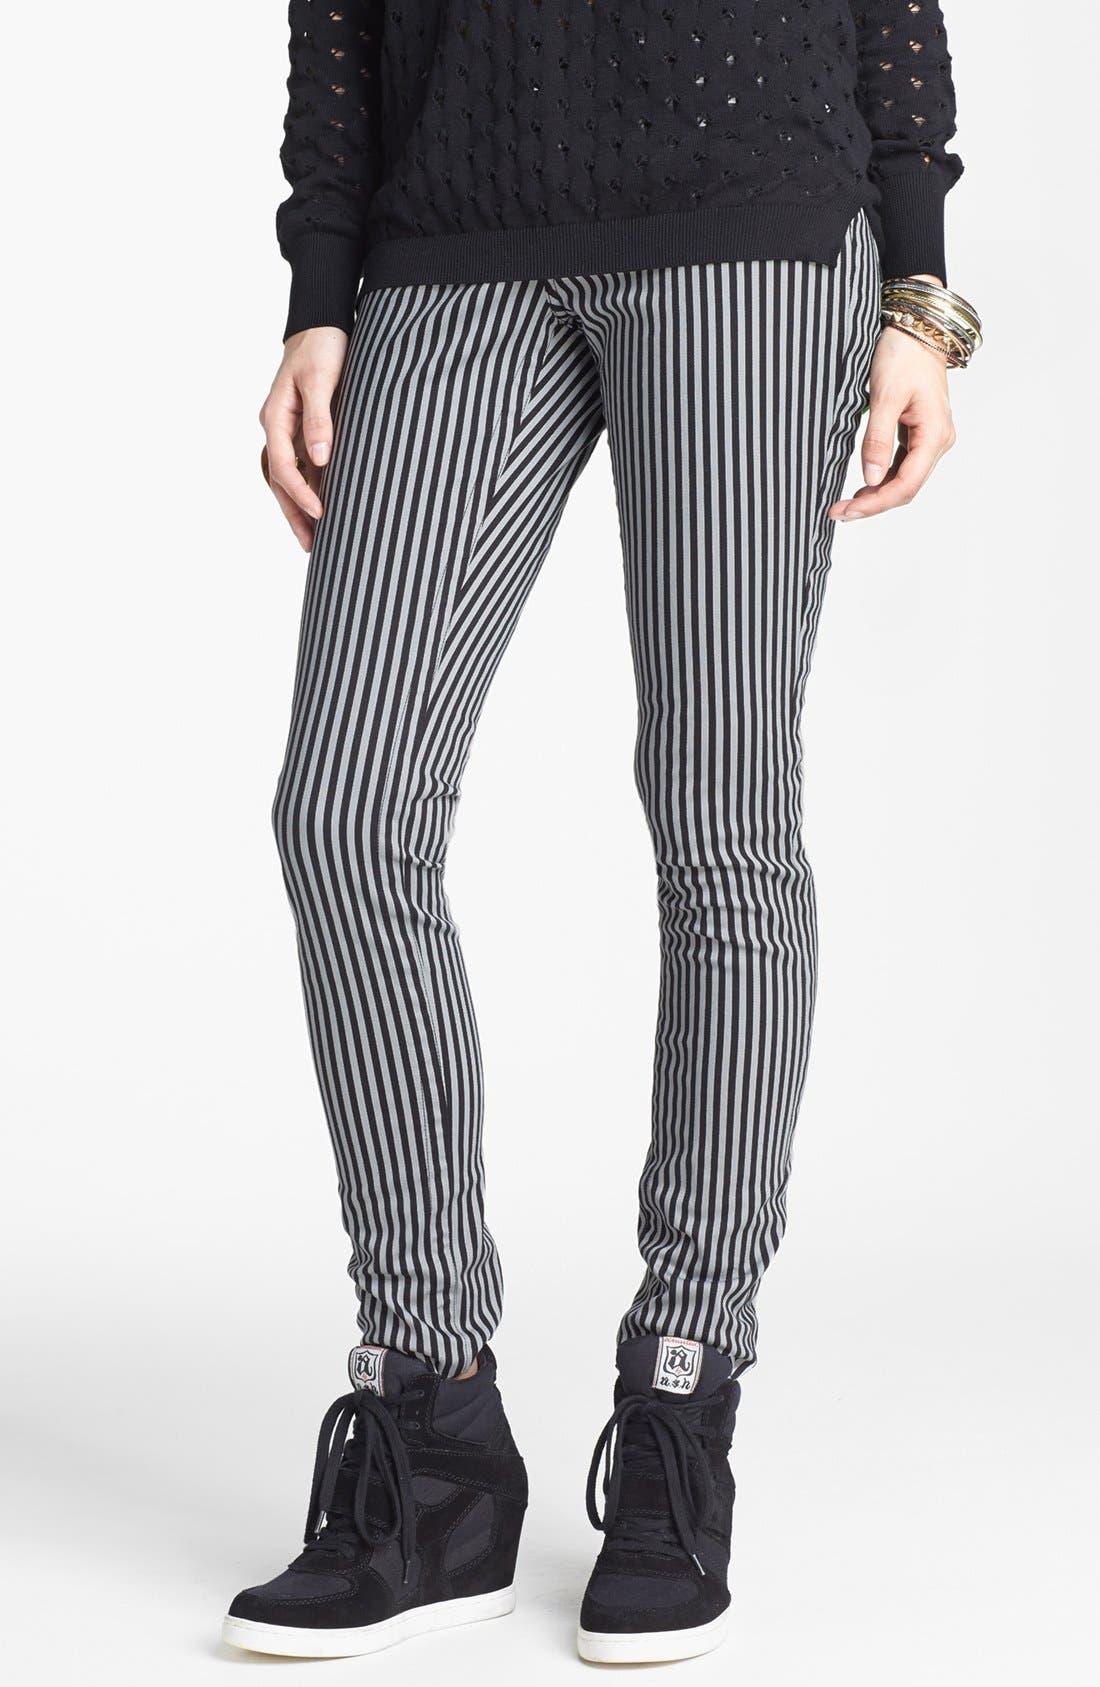 Main Image - INSTANT VINTAGE Stretch Denim Stripe Skinny Jeans (Juniors)